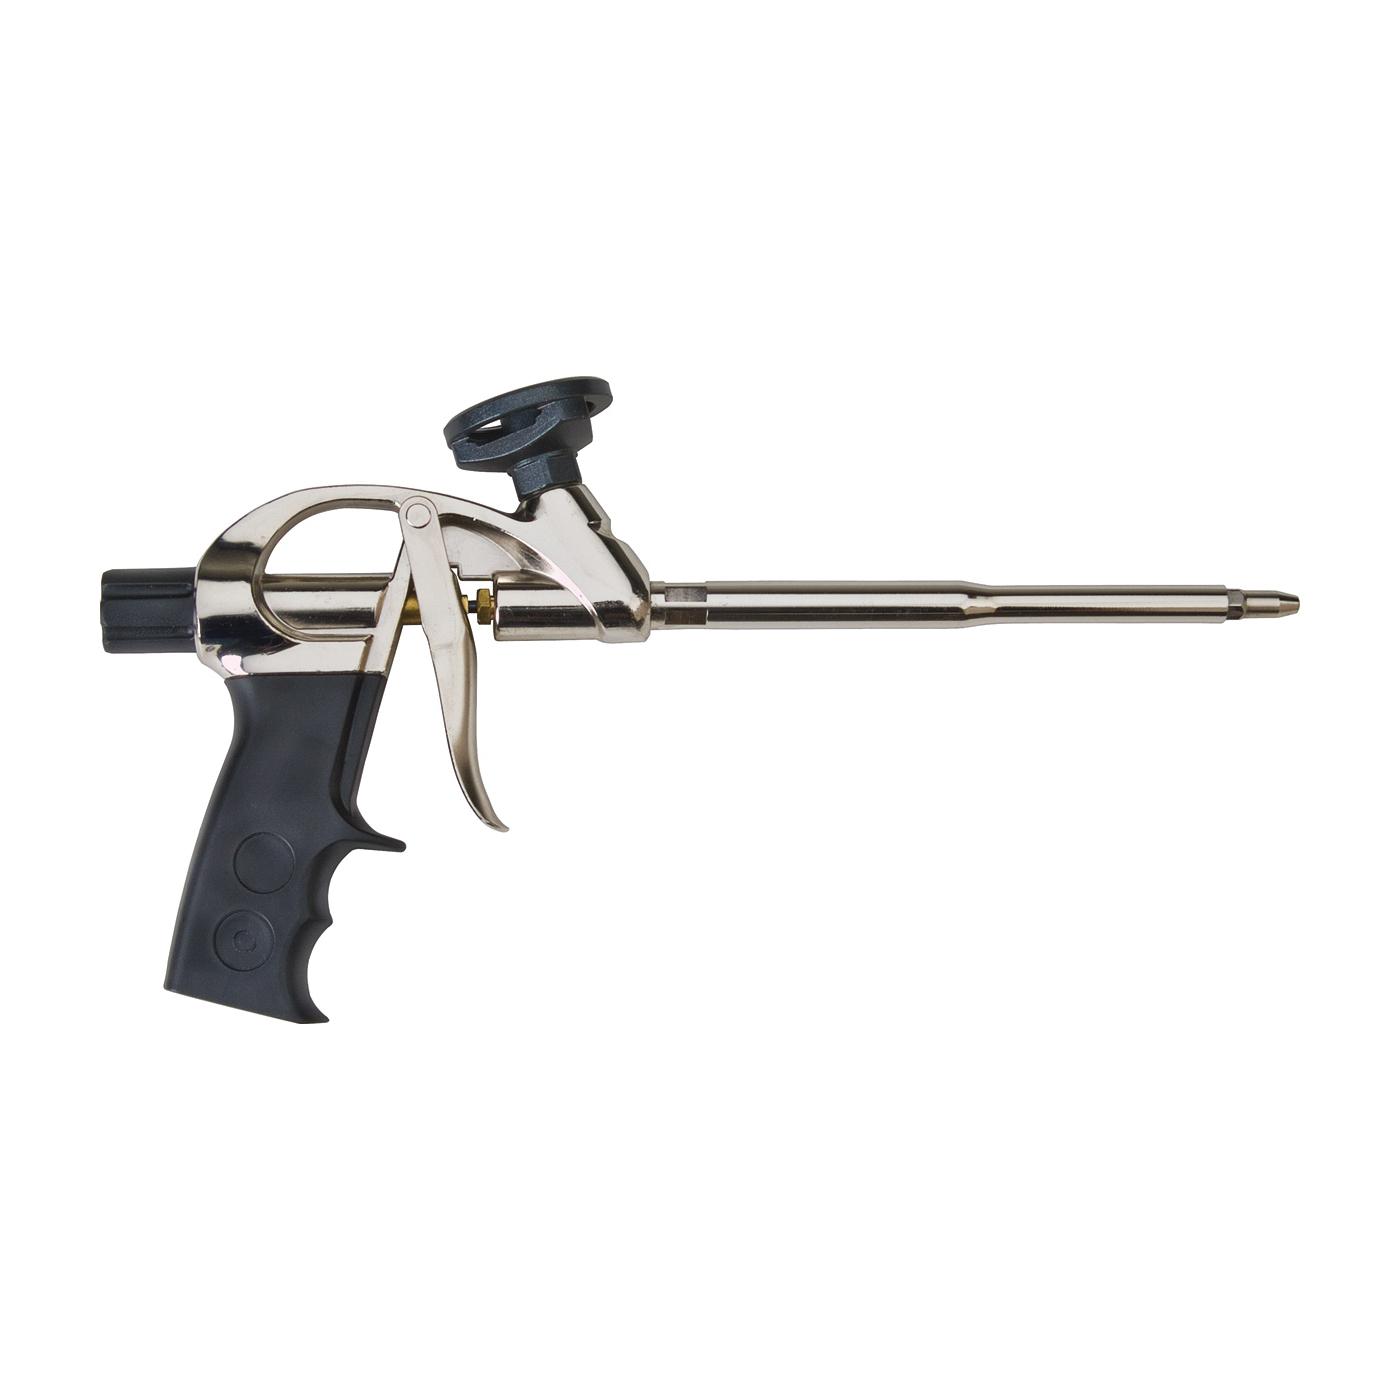 Picture of Dow Pro Grade 14 99046685 Foam Dispensing Gun